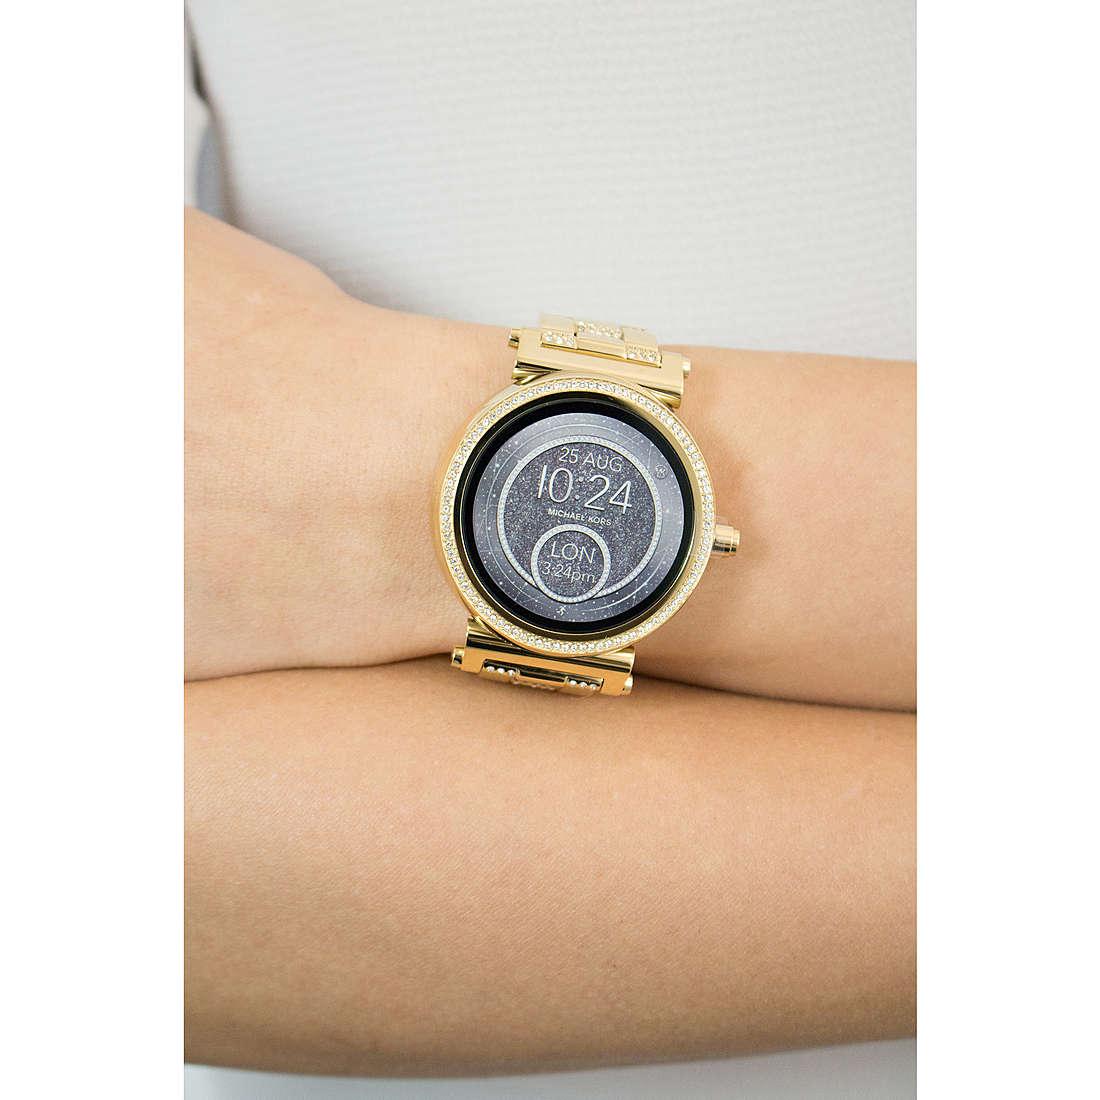 6319117b2e39 orologio Smartwatch donna Michael Kors Sofie MKT5023 Smartwatches ...